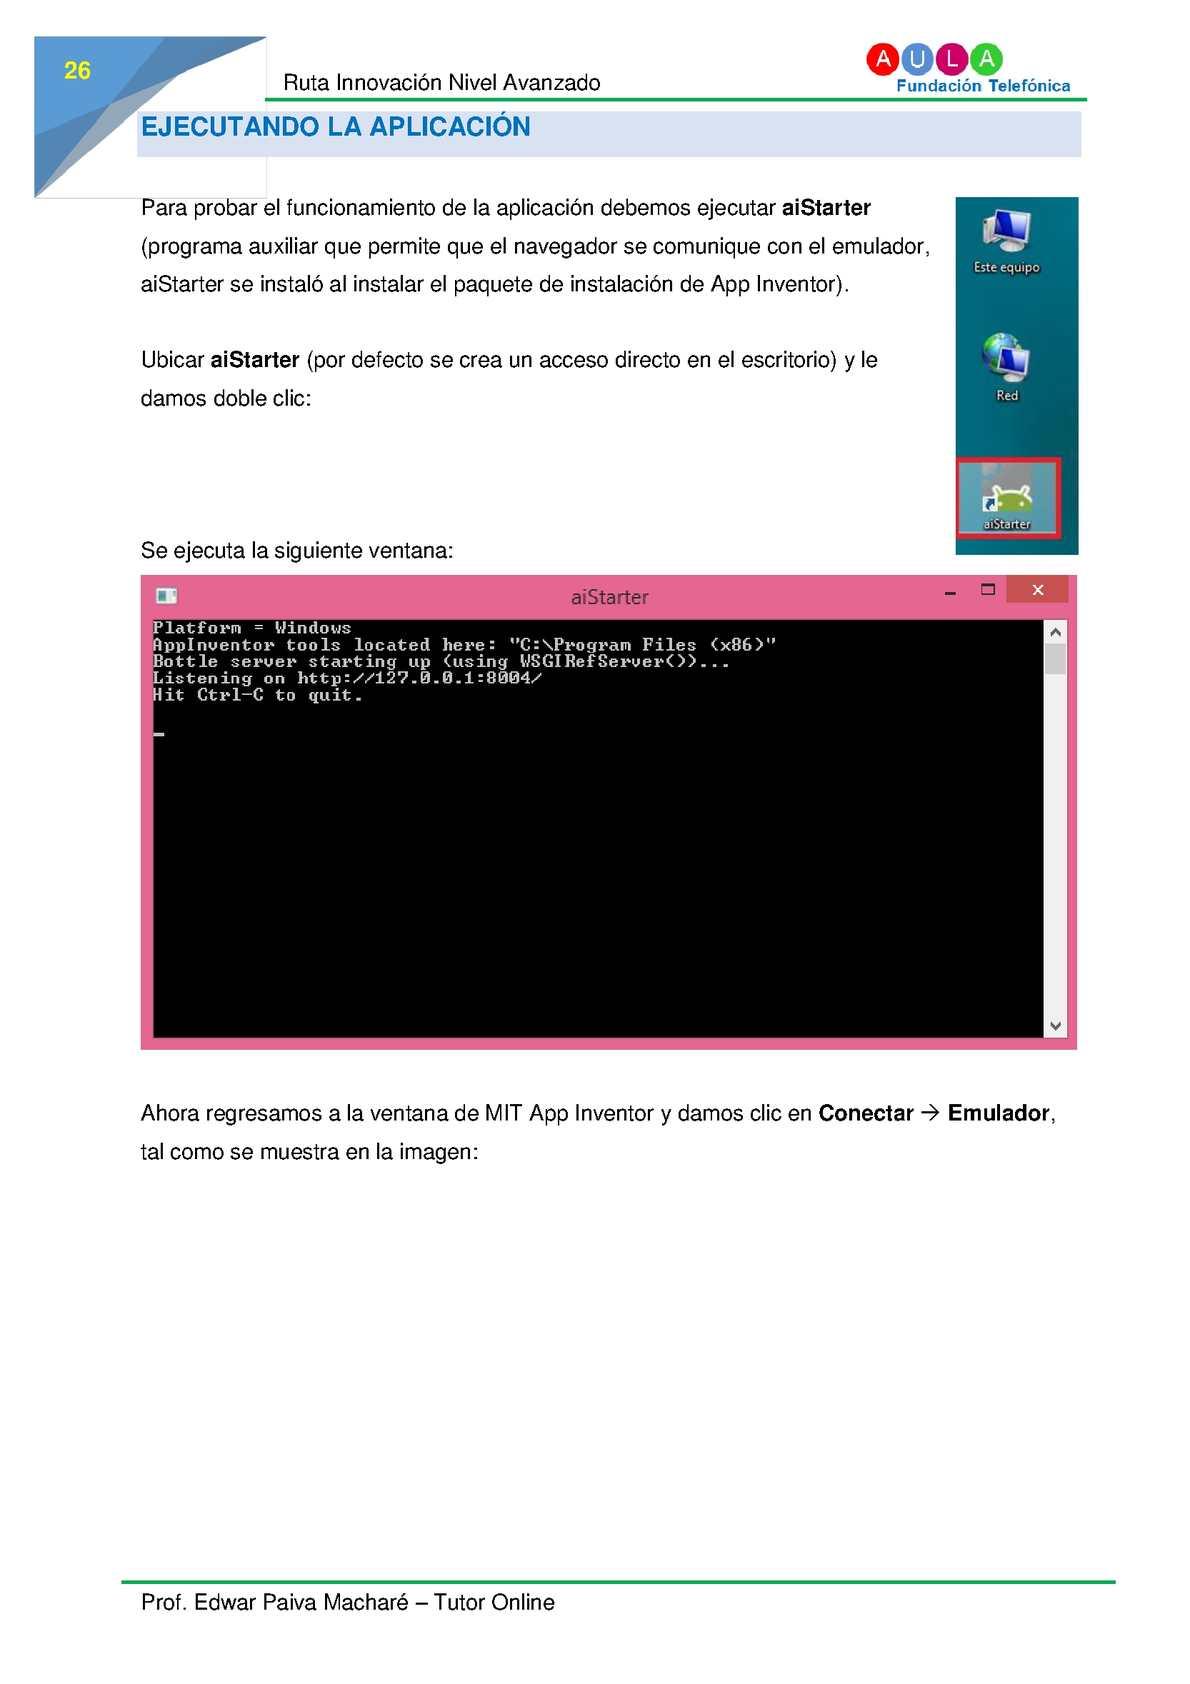 Tutorial Mit App Inventor 2 - CALAMEO Downloader